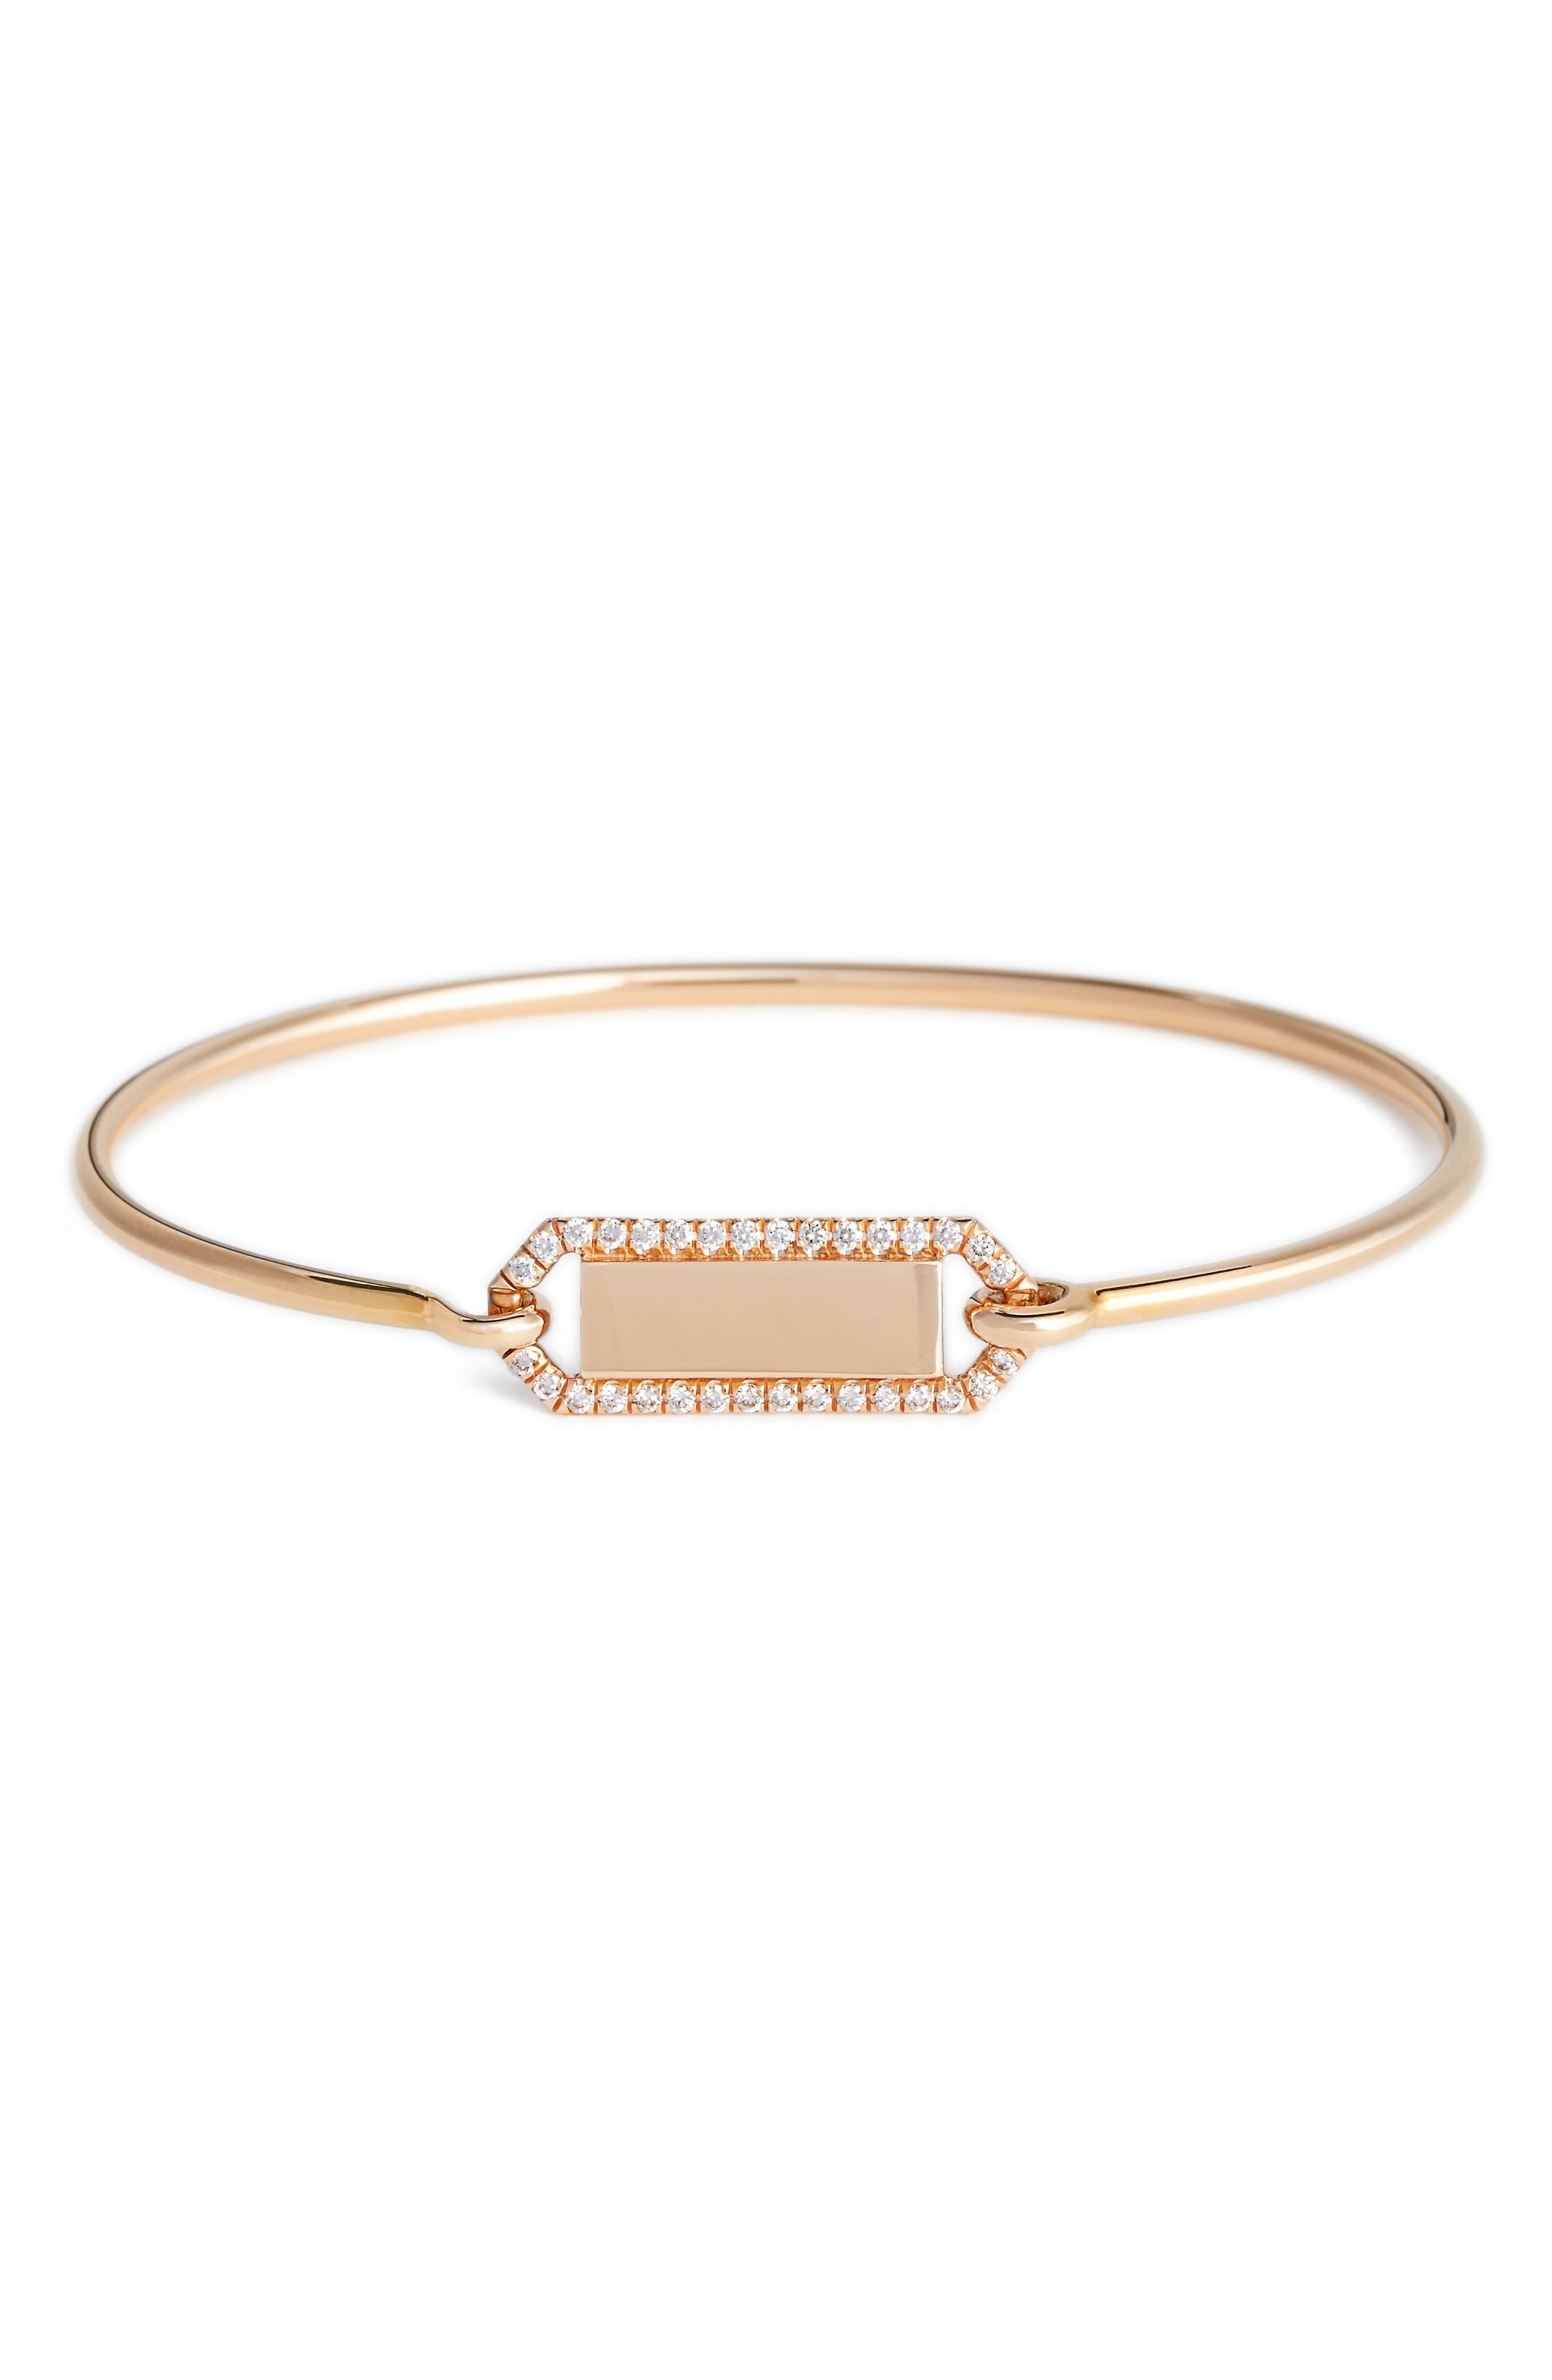 Personalized Diamond & Rose Gold Bangle,                         Main,                         color, Diamond